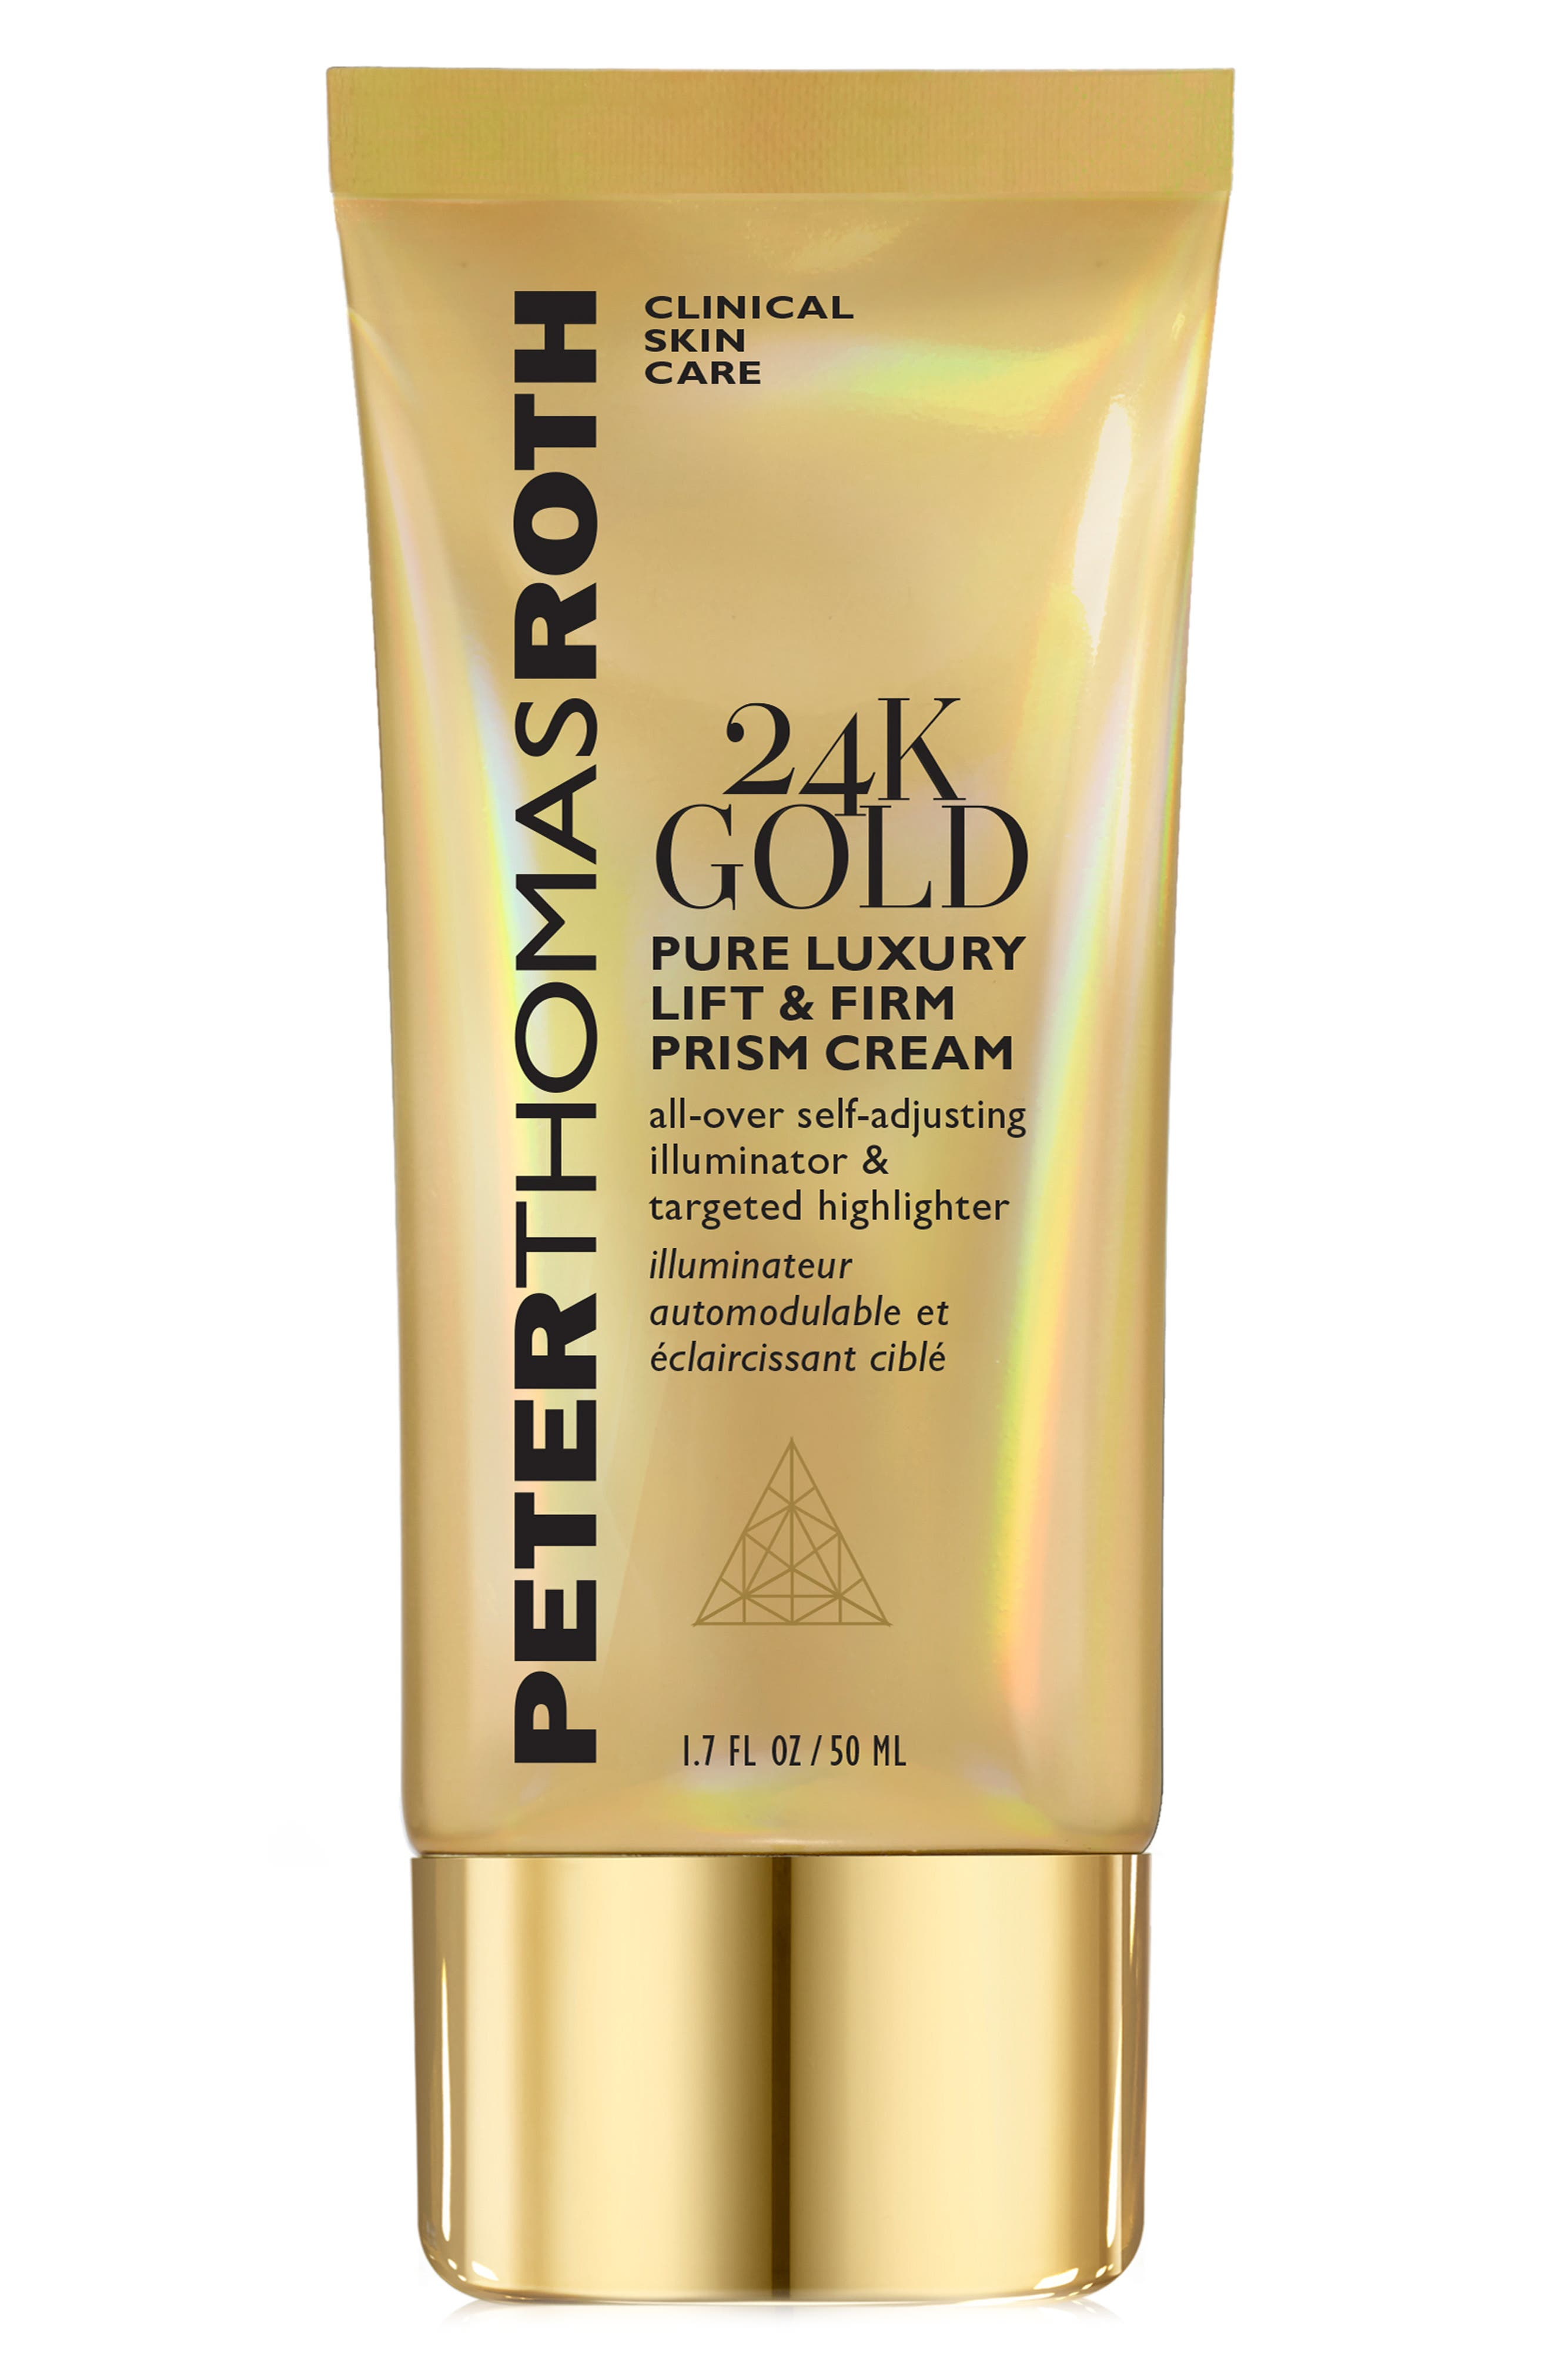 24K Gold Pure Luxury Lift & Firm Prism Cream,                             Main thumbnail 1, color,                             NO COLOR